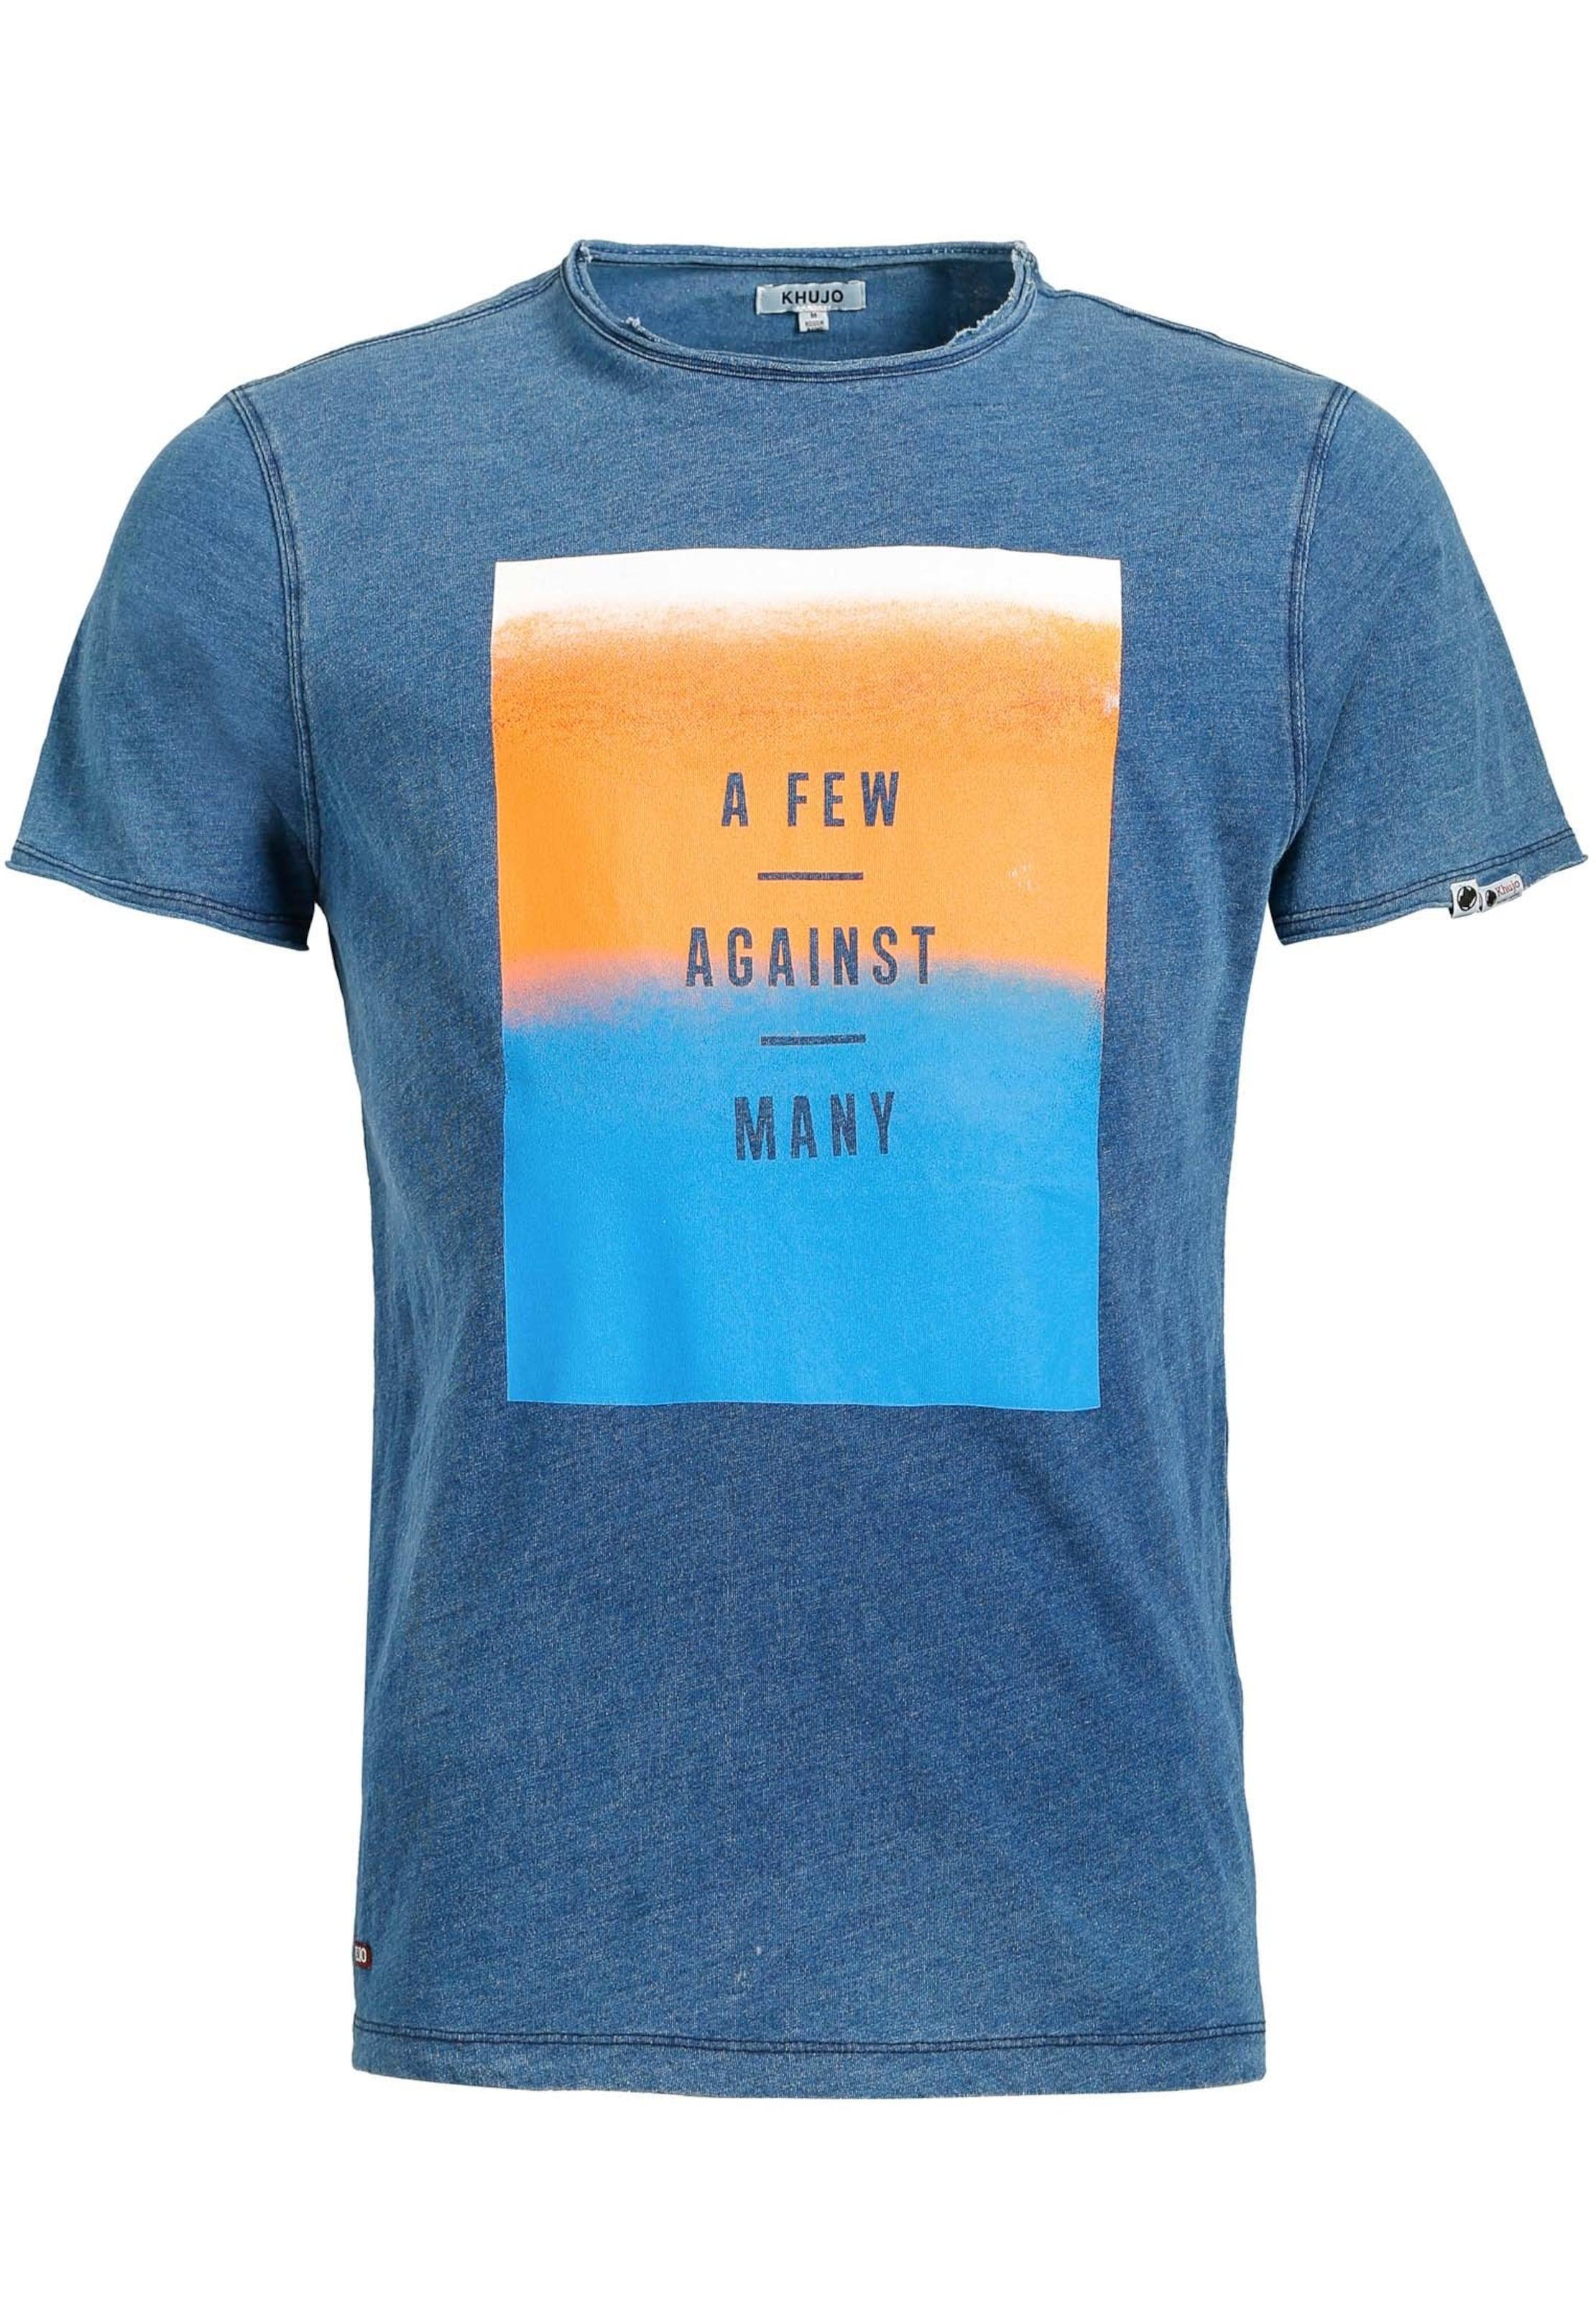 shirt T 'rugby Denim Ombre' Blue Khujo In ChBtQrdxs